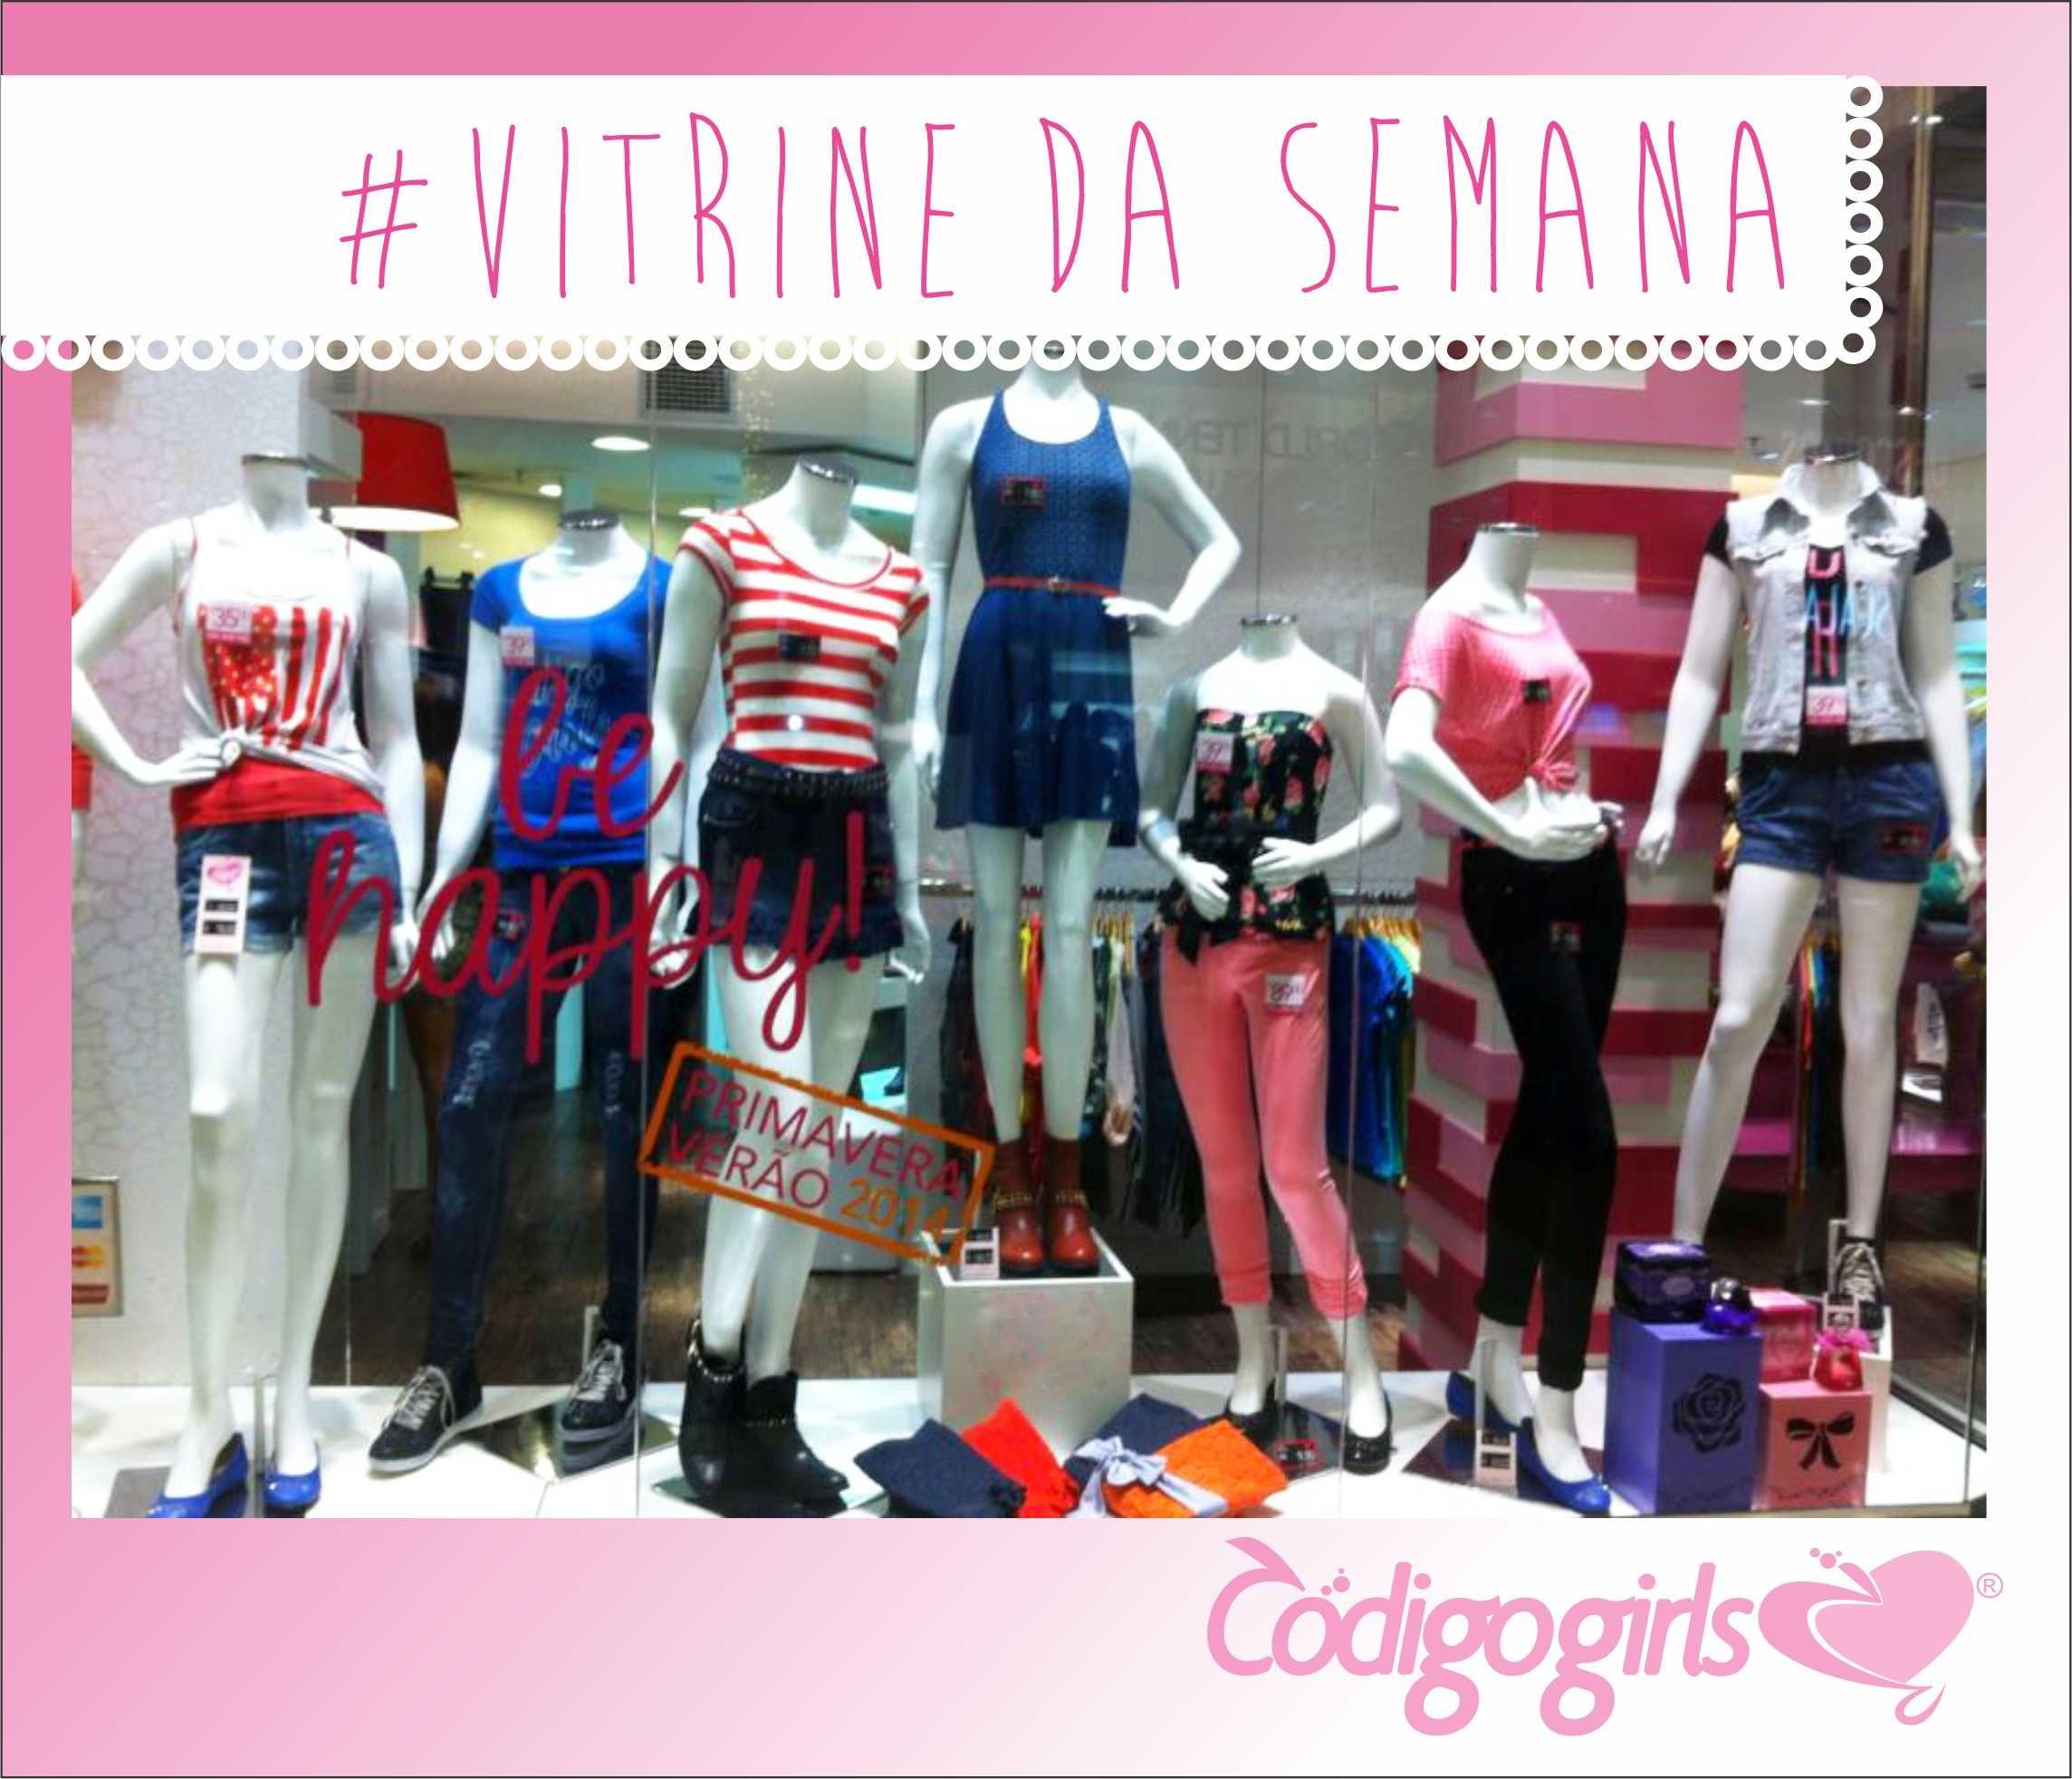 #VitrineDaSemana  a Vitrine dessa semana é do Shopping Aricanduva  #MelhorDaSemana #Vitrine #Aricanduva